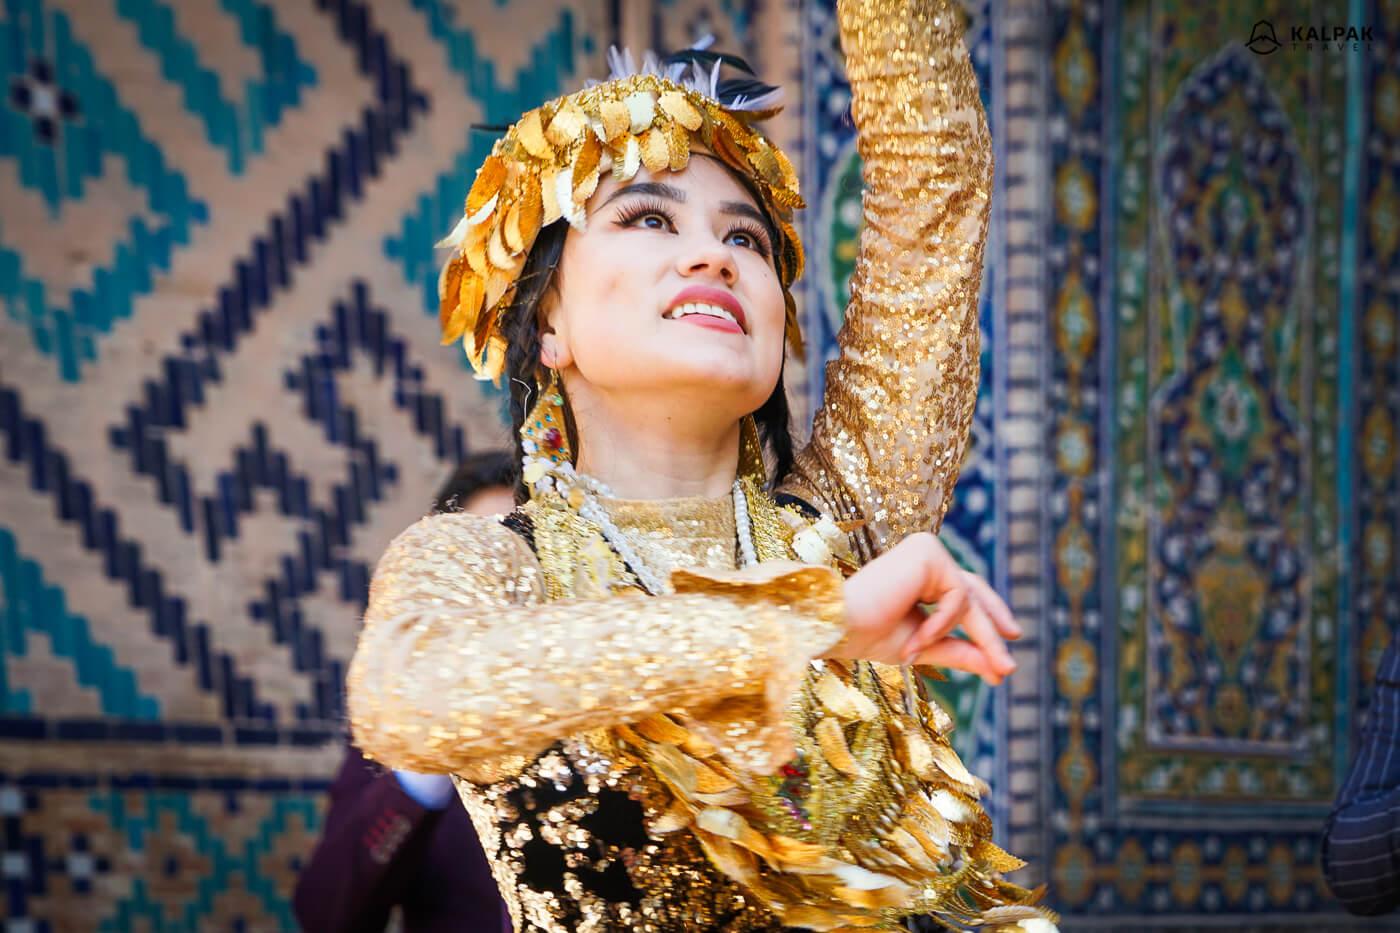 The legend of Bibi Khanum in Samarkand, Uzbek girl dancing in golden dress